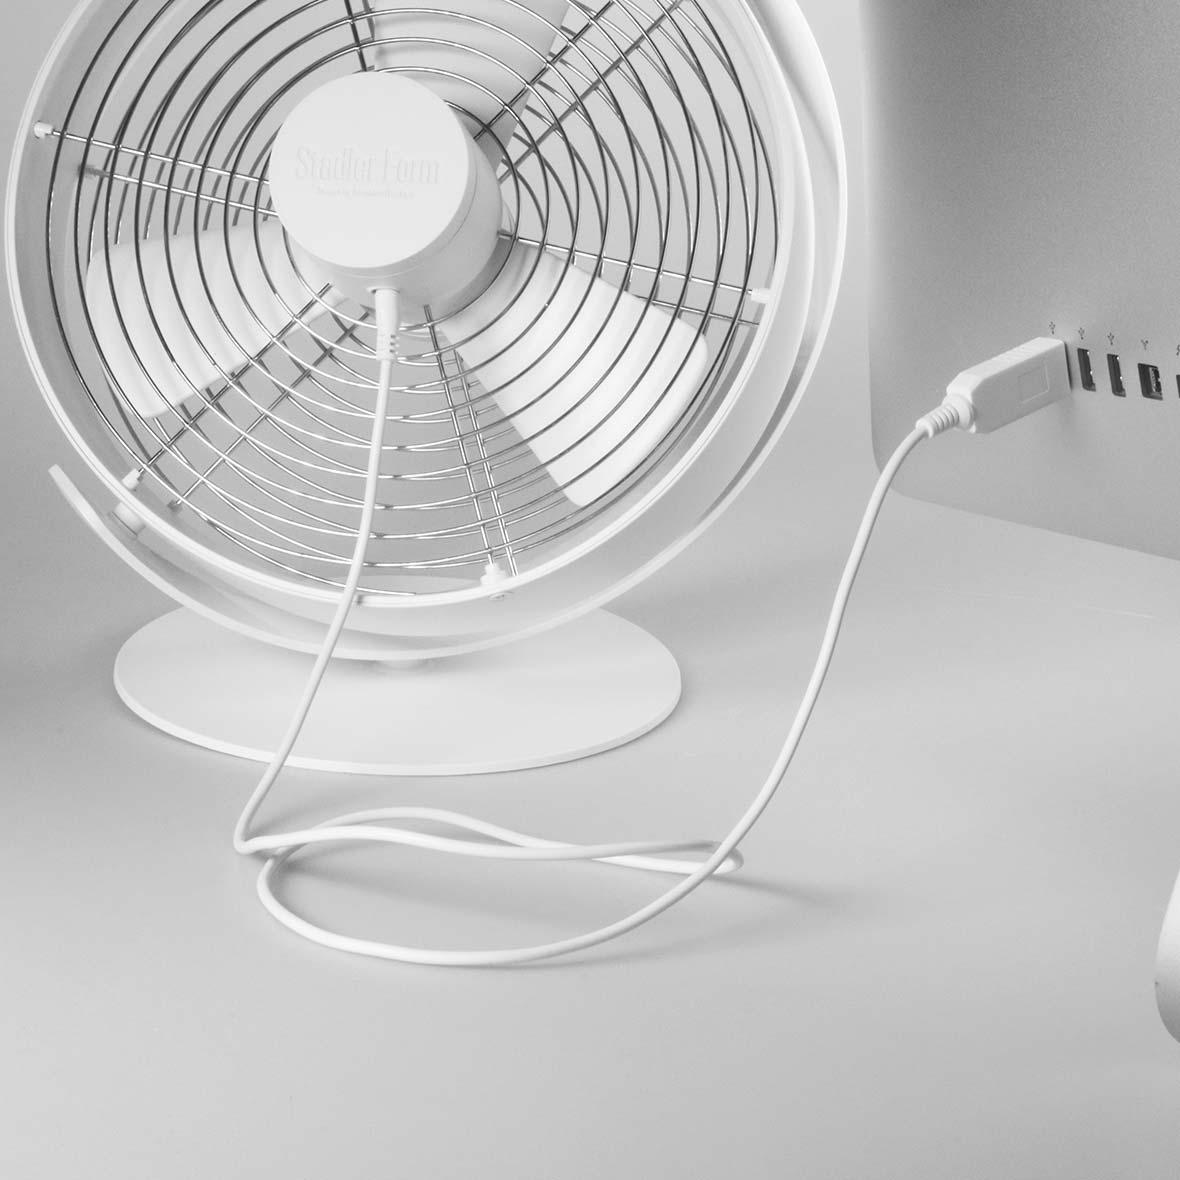 ventilator tim usb anschluss stadler form